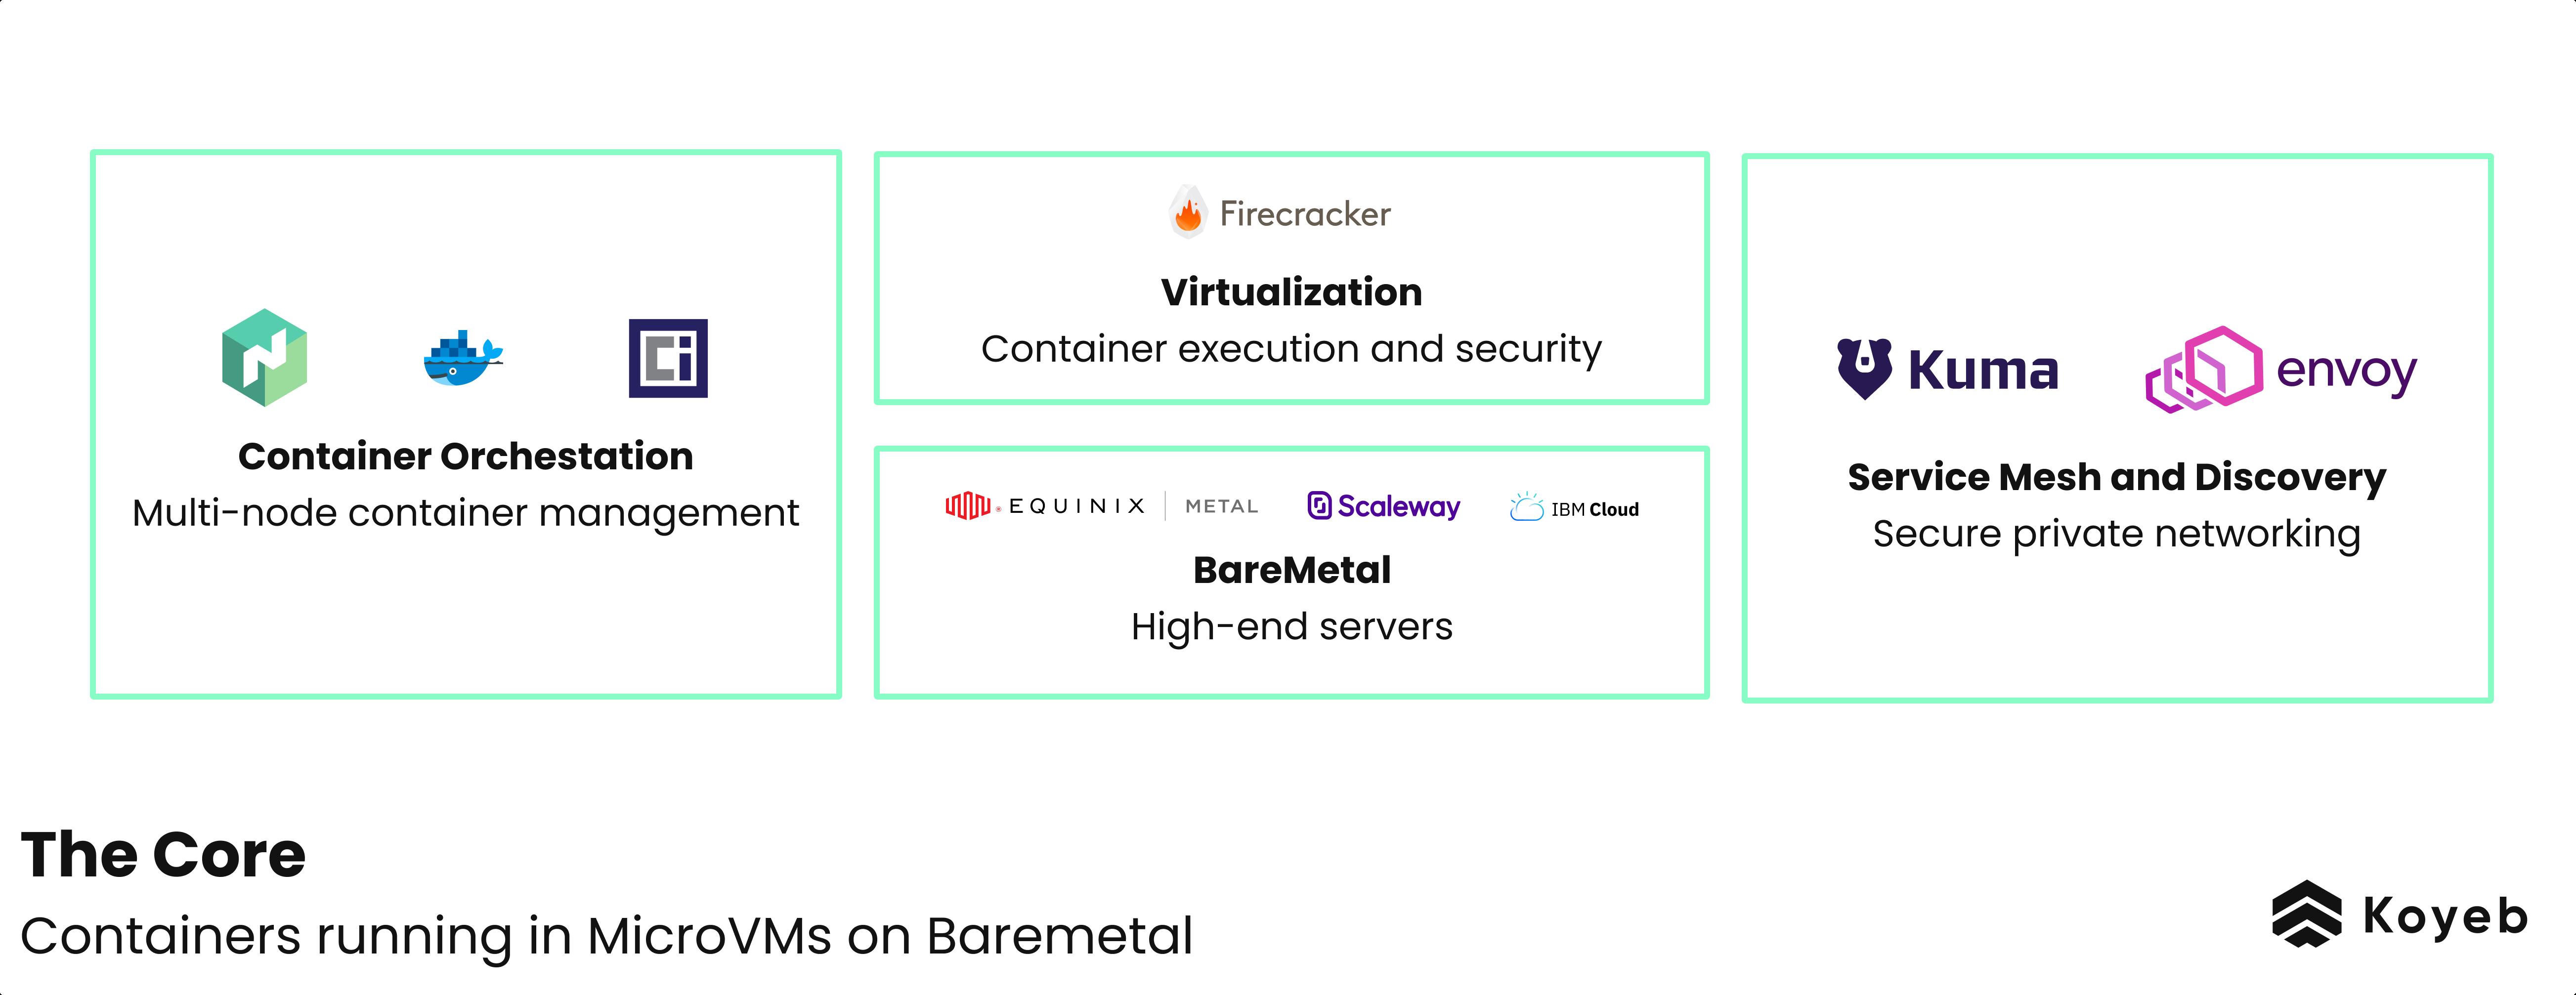 Koyeb Serverless Platform Core Internal Componets